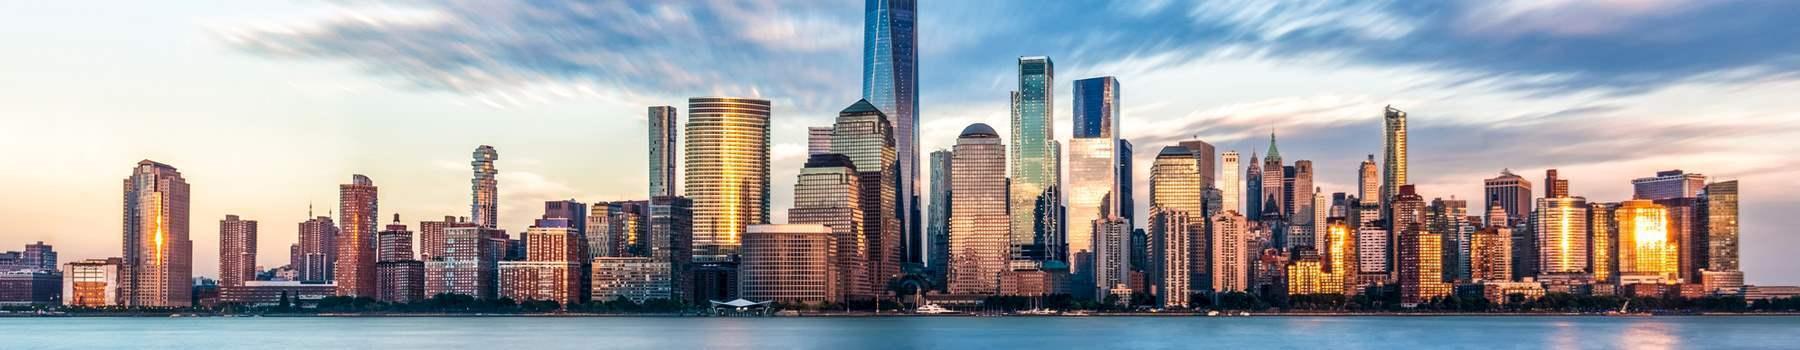 Theater District Newyork top